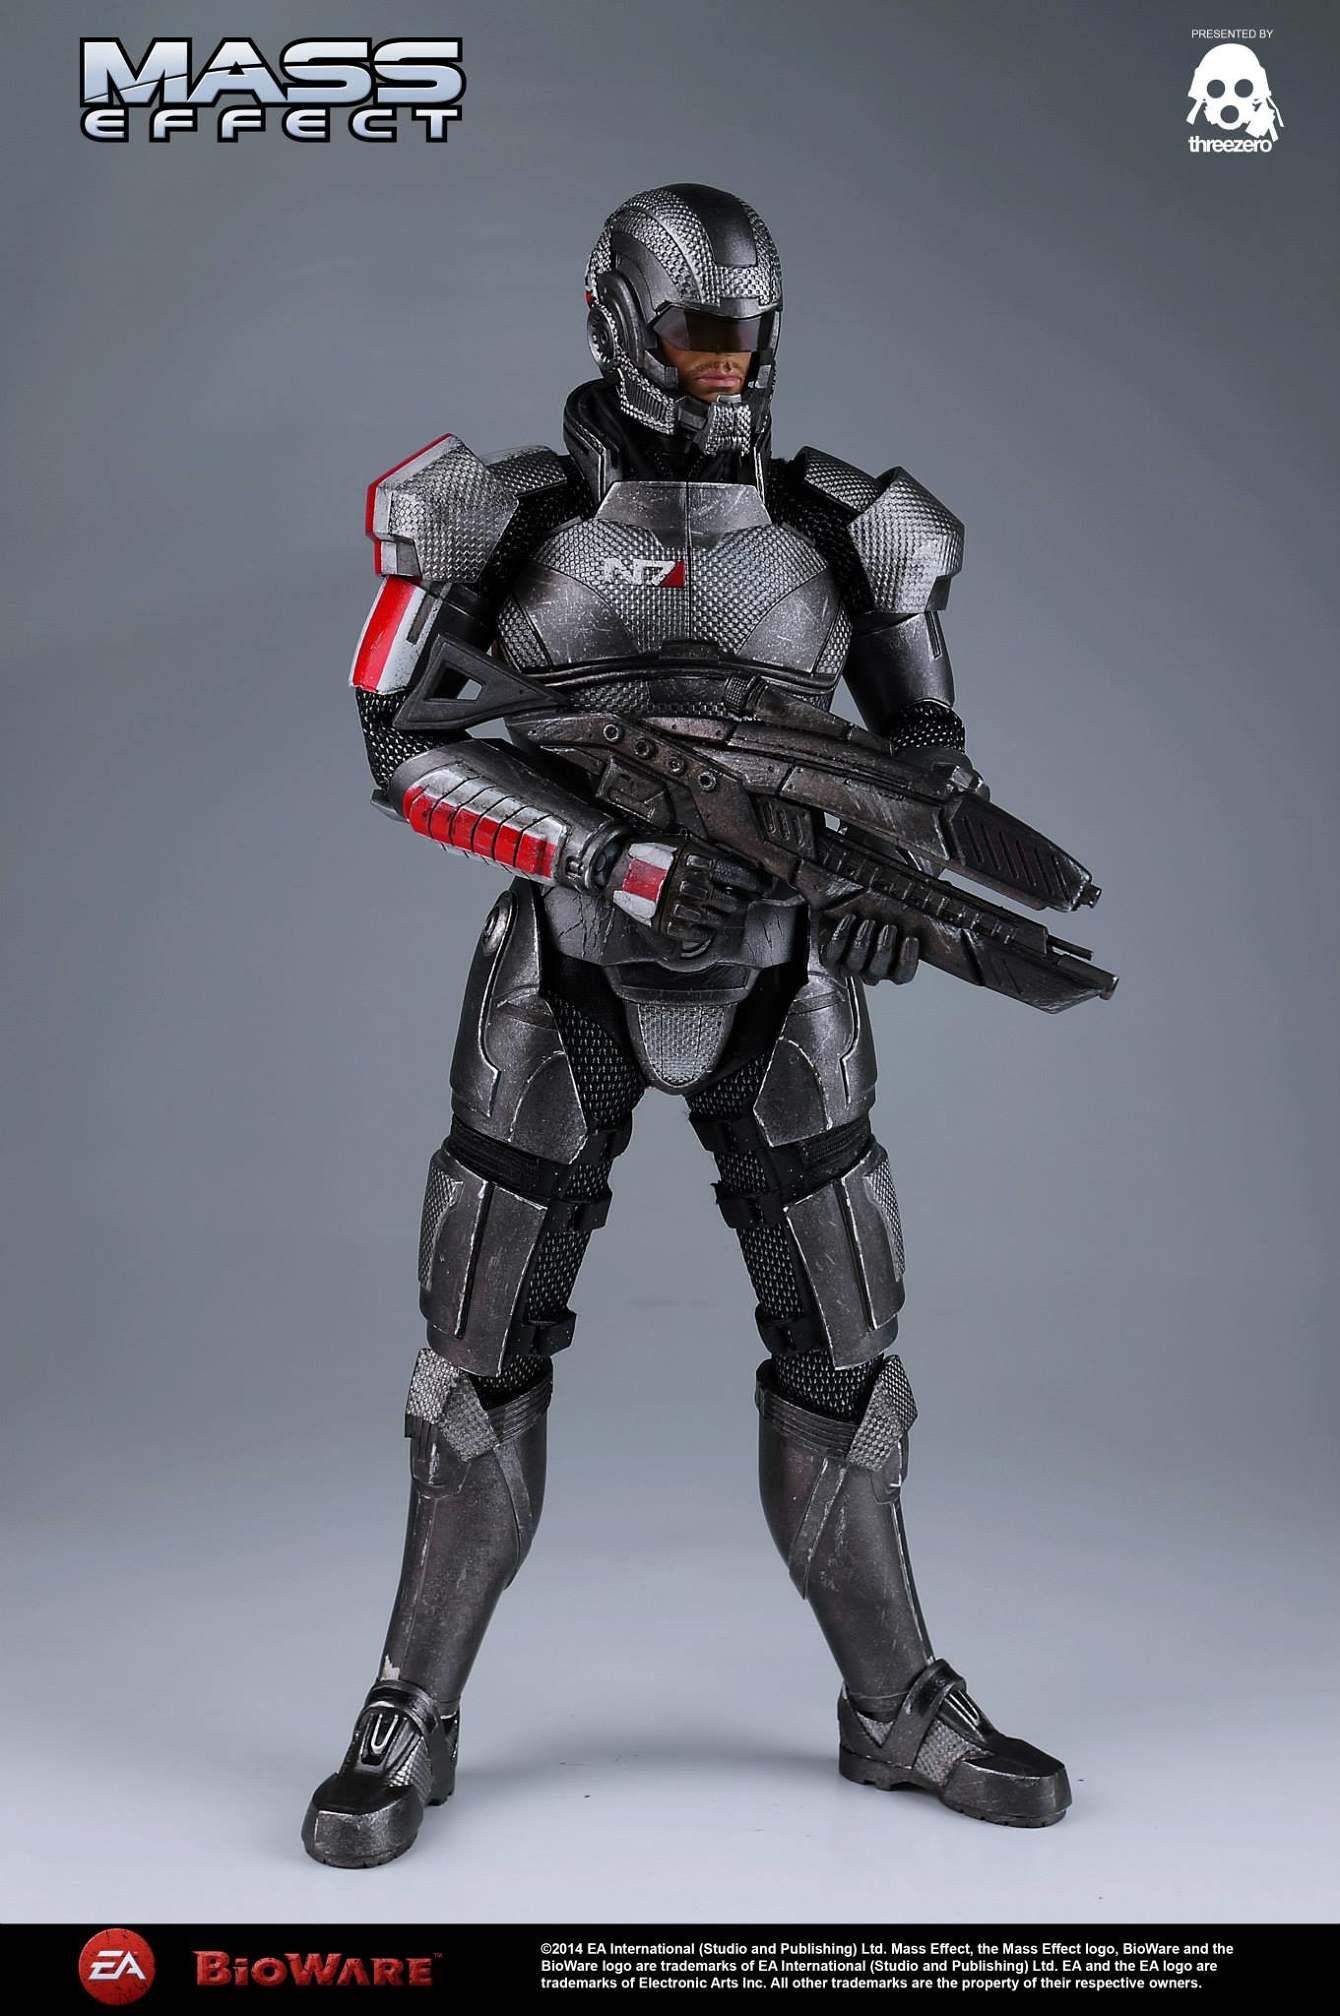 ThreeZero-Bioware-video-game-Shepard-10465520_997493210276507_4259927781135410788_o_1340_c.jpg